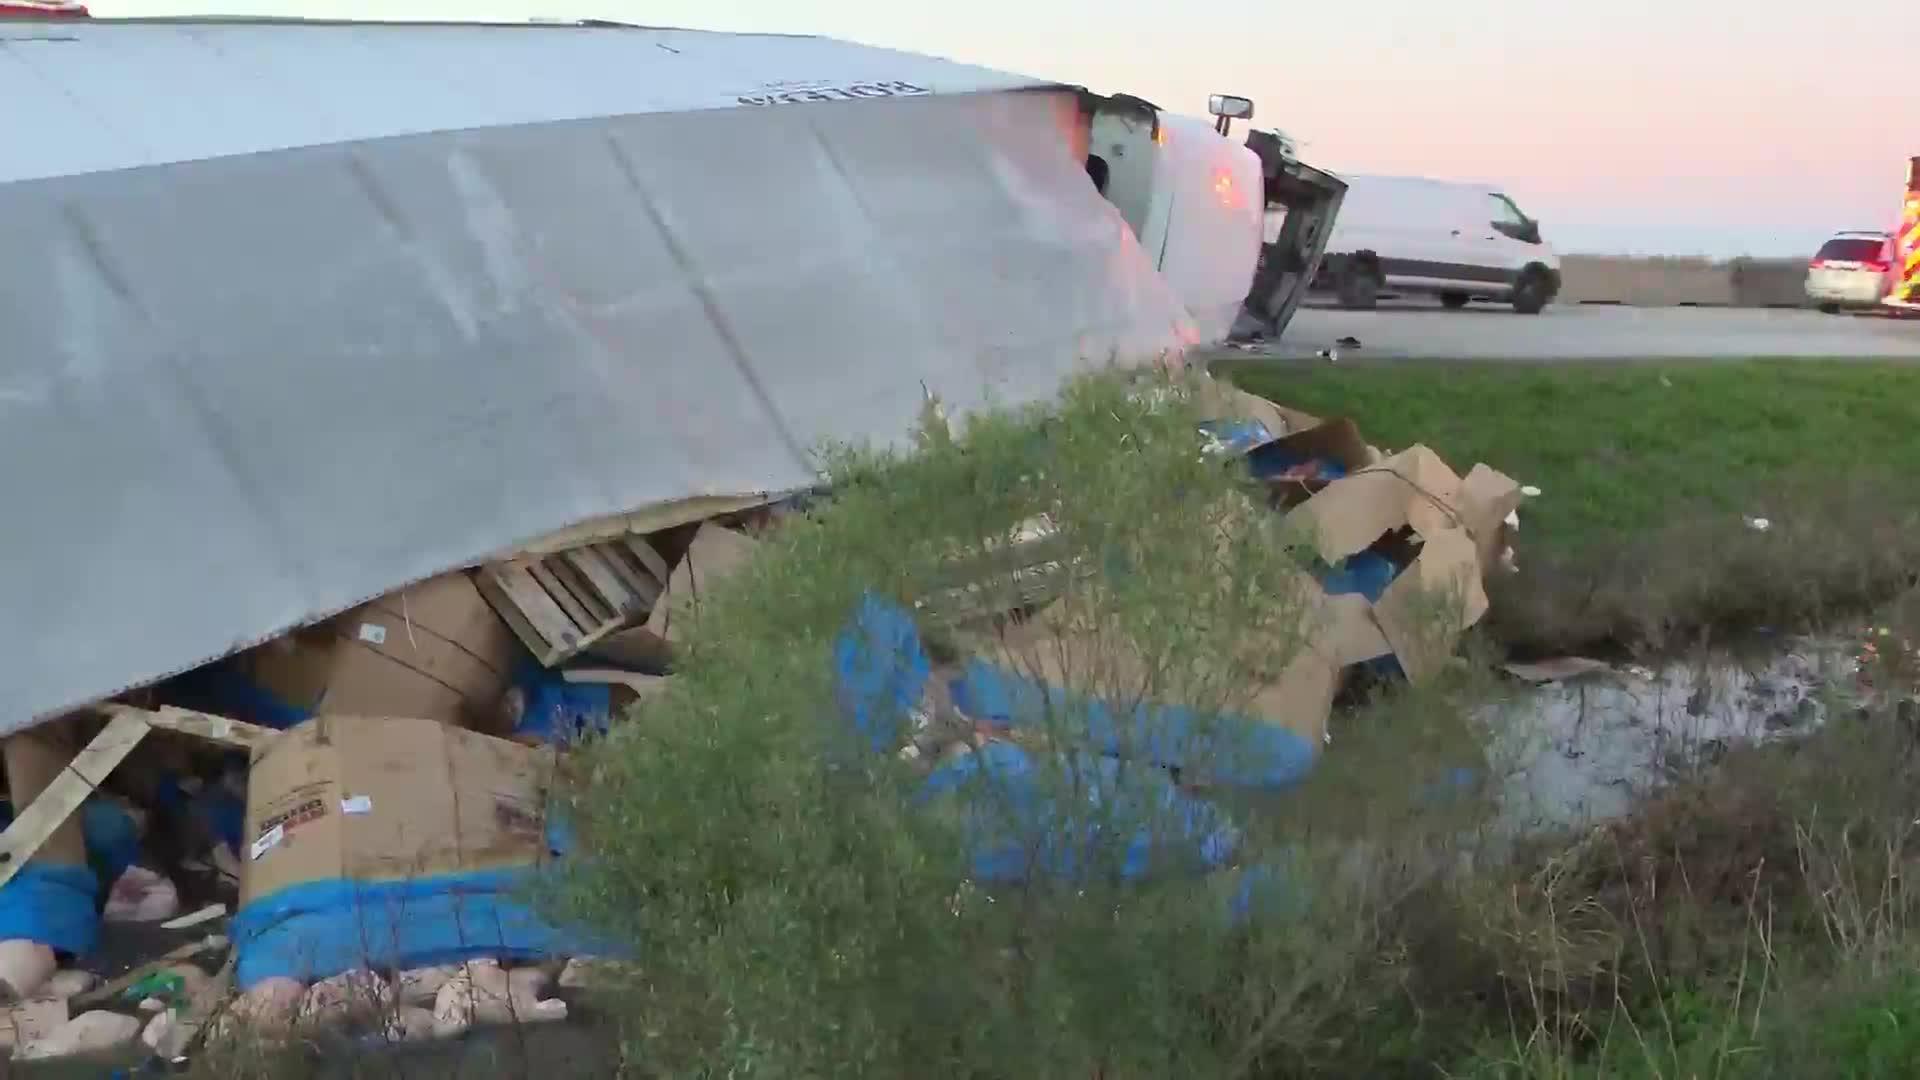 Tractor-trailer overturns, dumps pig parts on highway